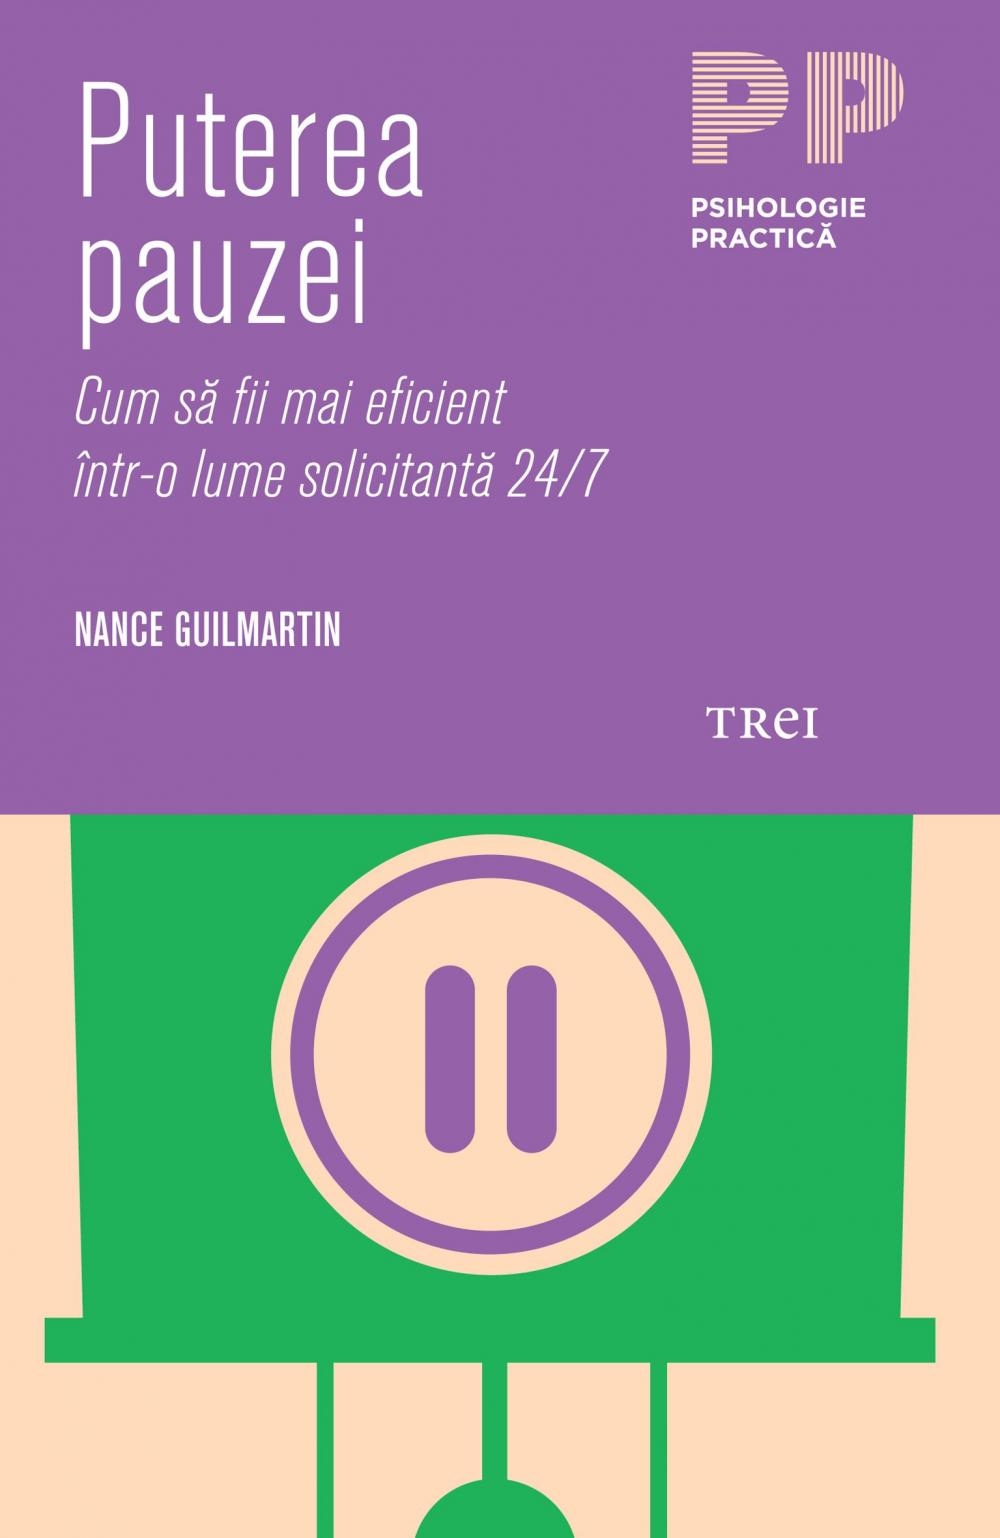 PUTEREA PAUZEI. CUM SA FII EFICIENT INTR-O LUME SOLICITANTA 24/7